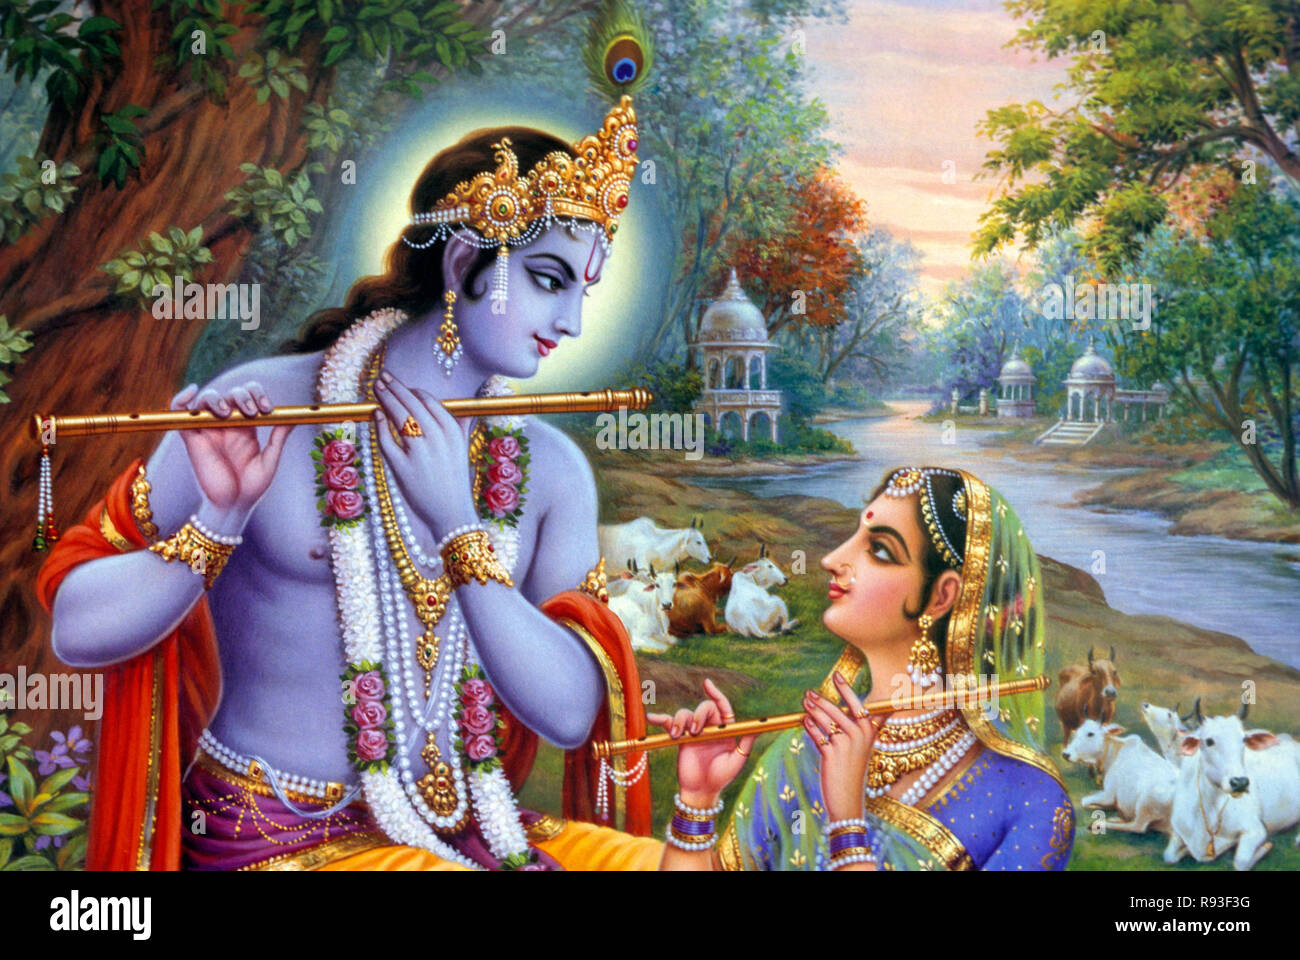 Wallpaper Radha Krishna Painting Images Hd